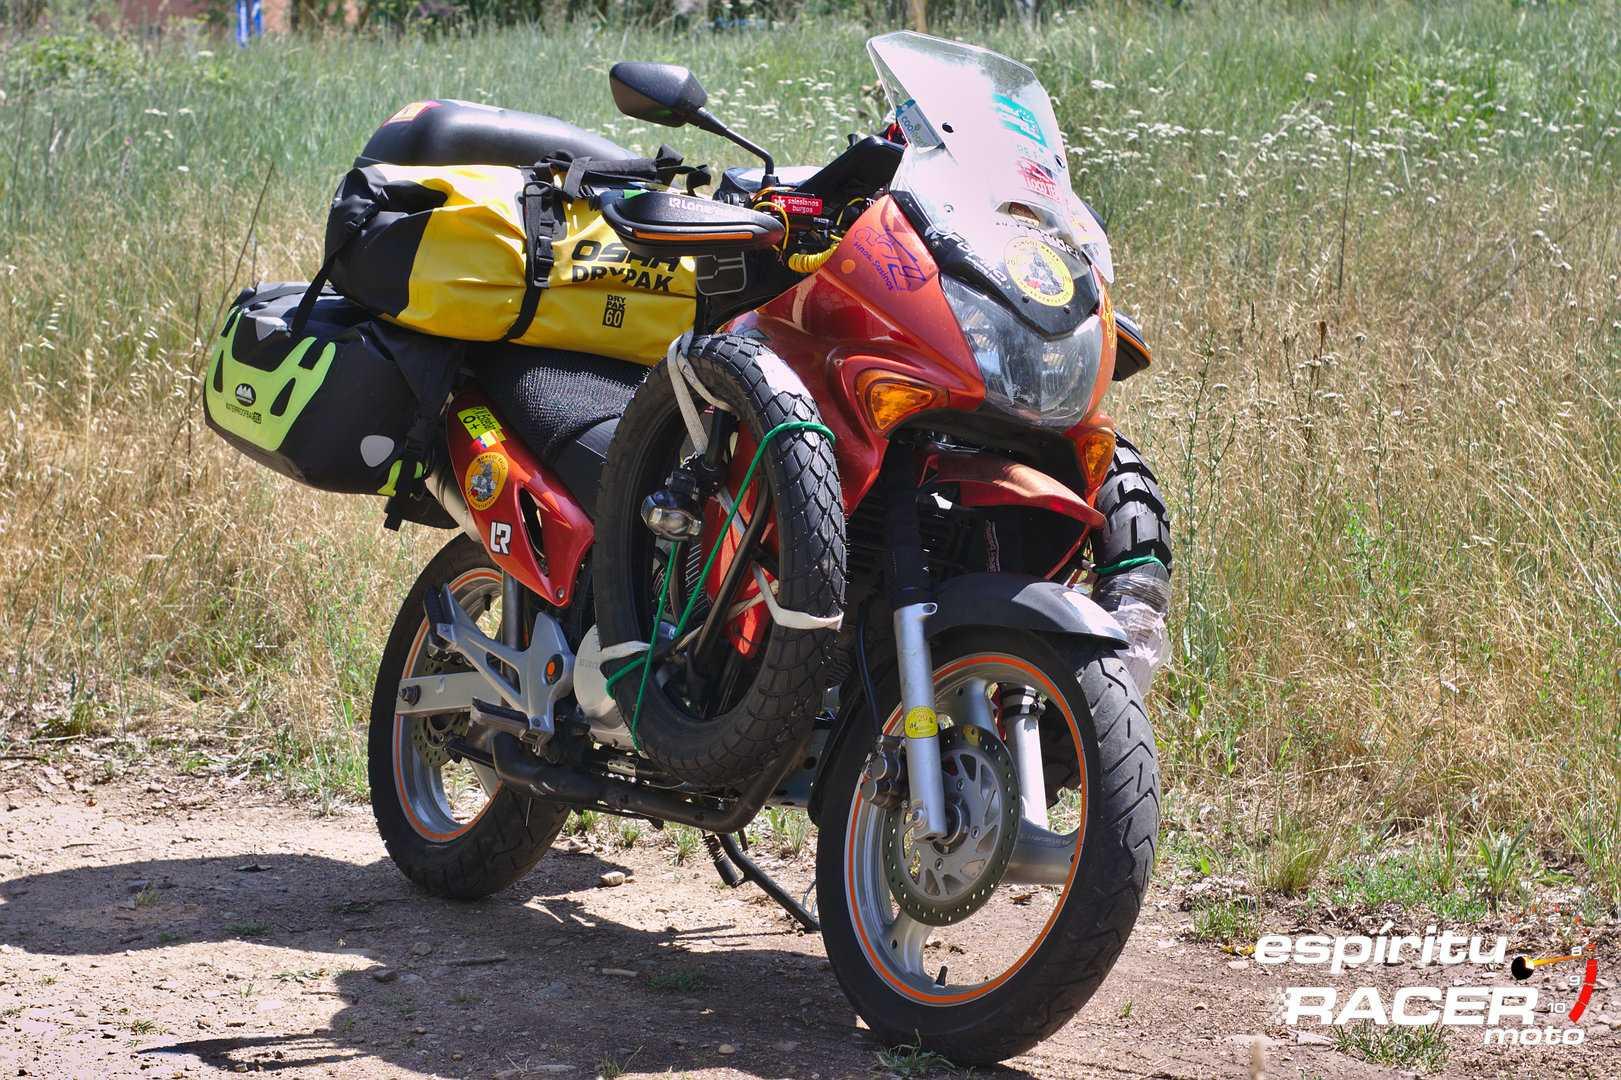 Pedro a Mongolia espirituRACER moto 04